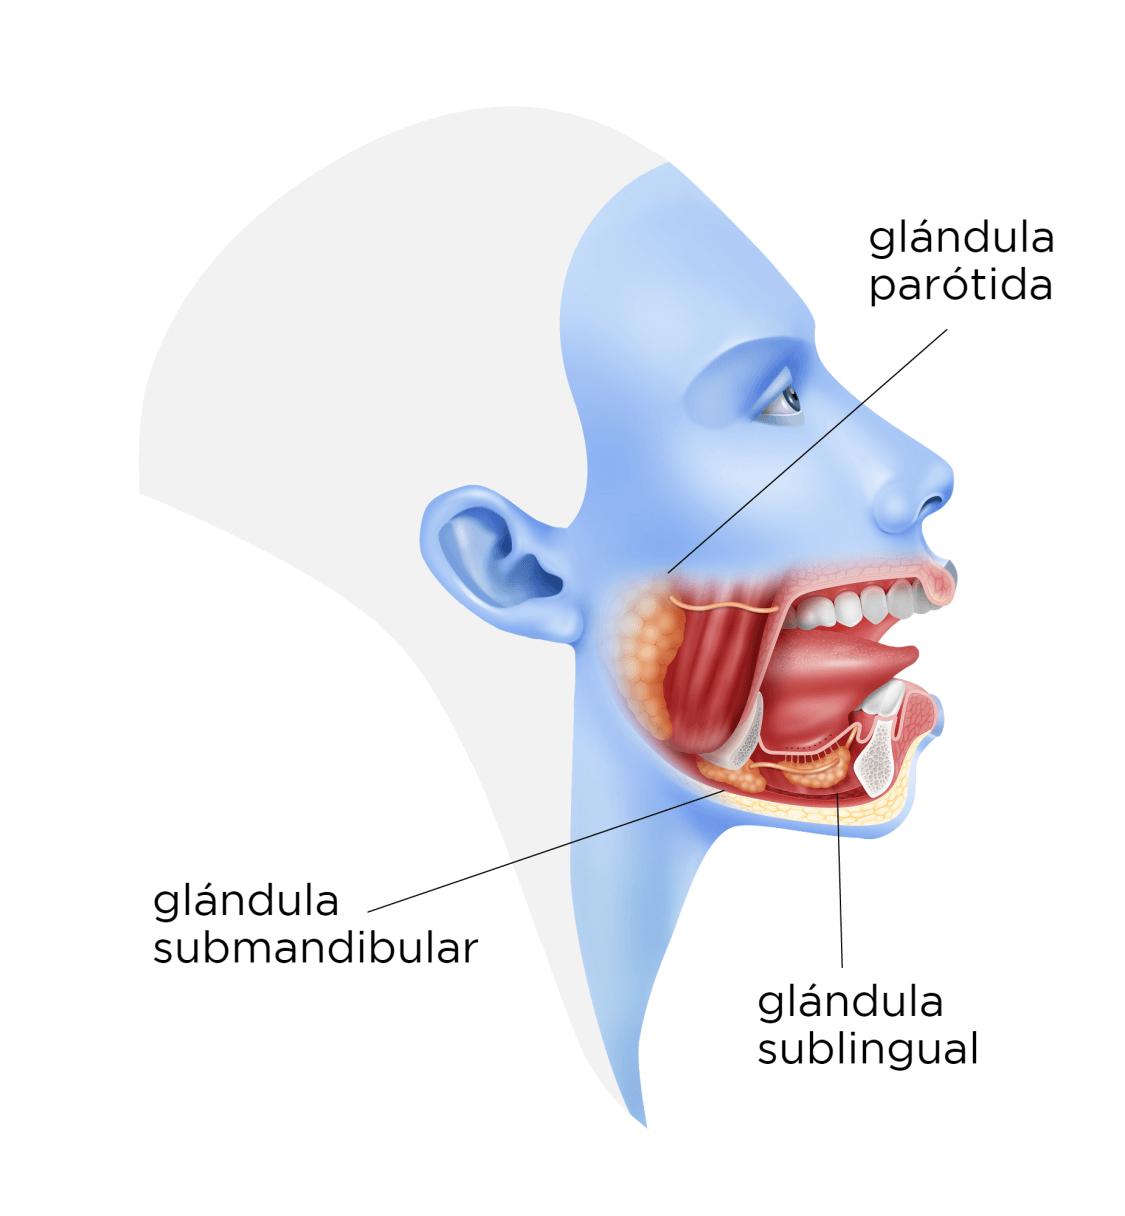 Dolor en la glandula parotida izquierda